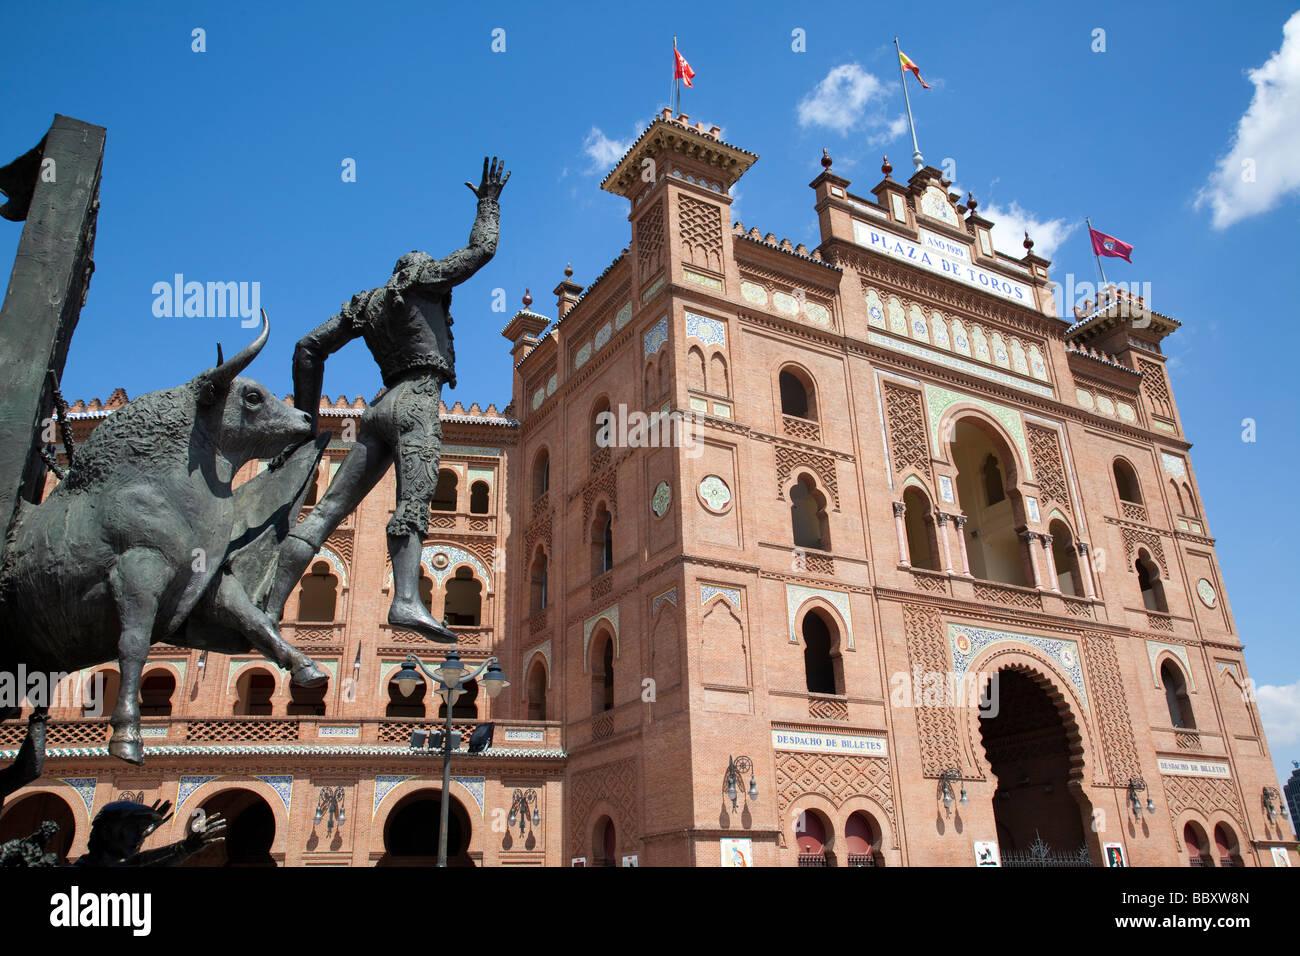 Plaza de Toros de Las Ventas bullring, Madrid, Spain - Stock Image